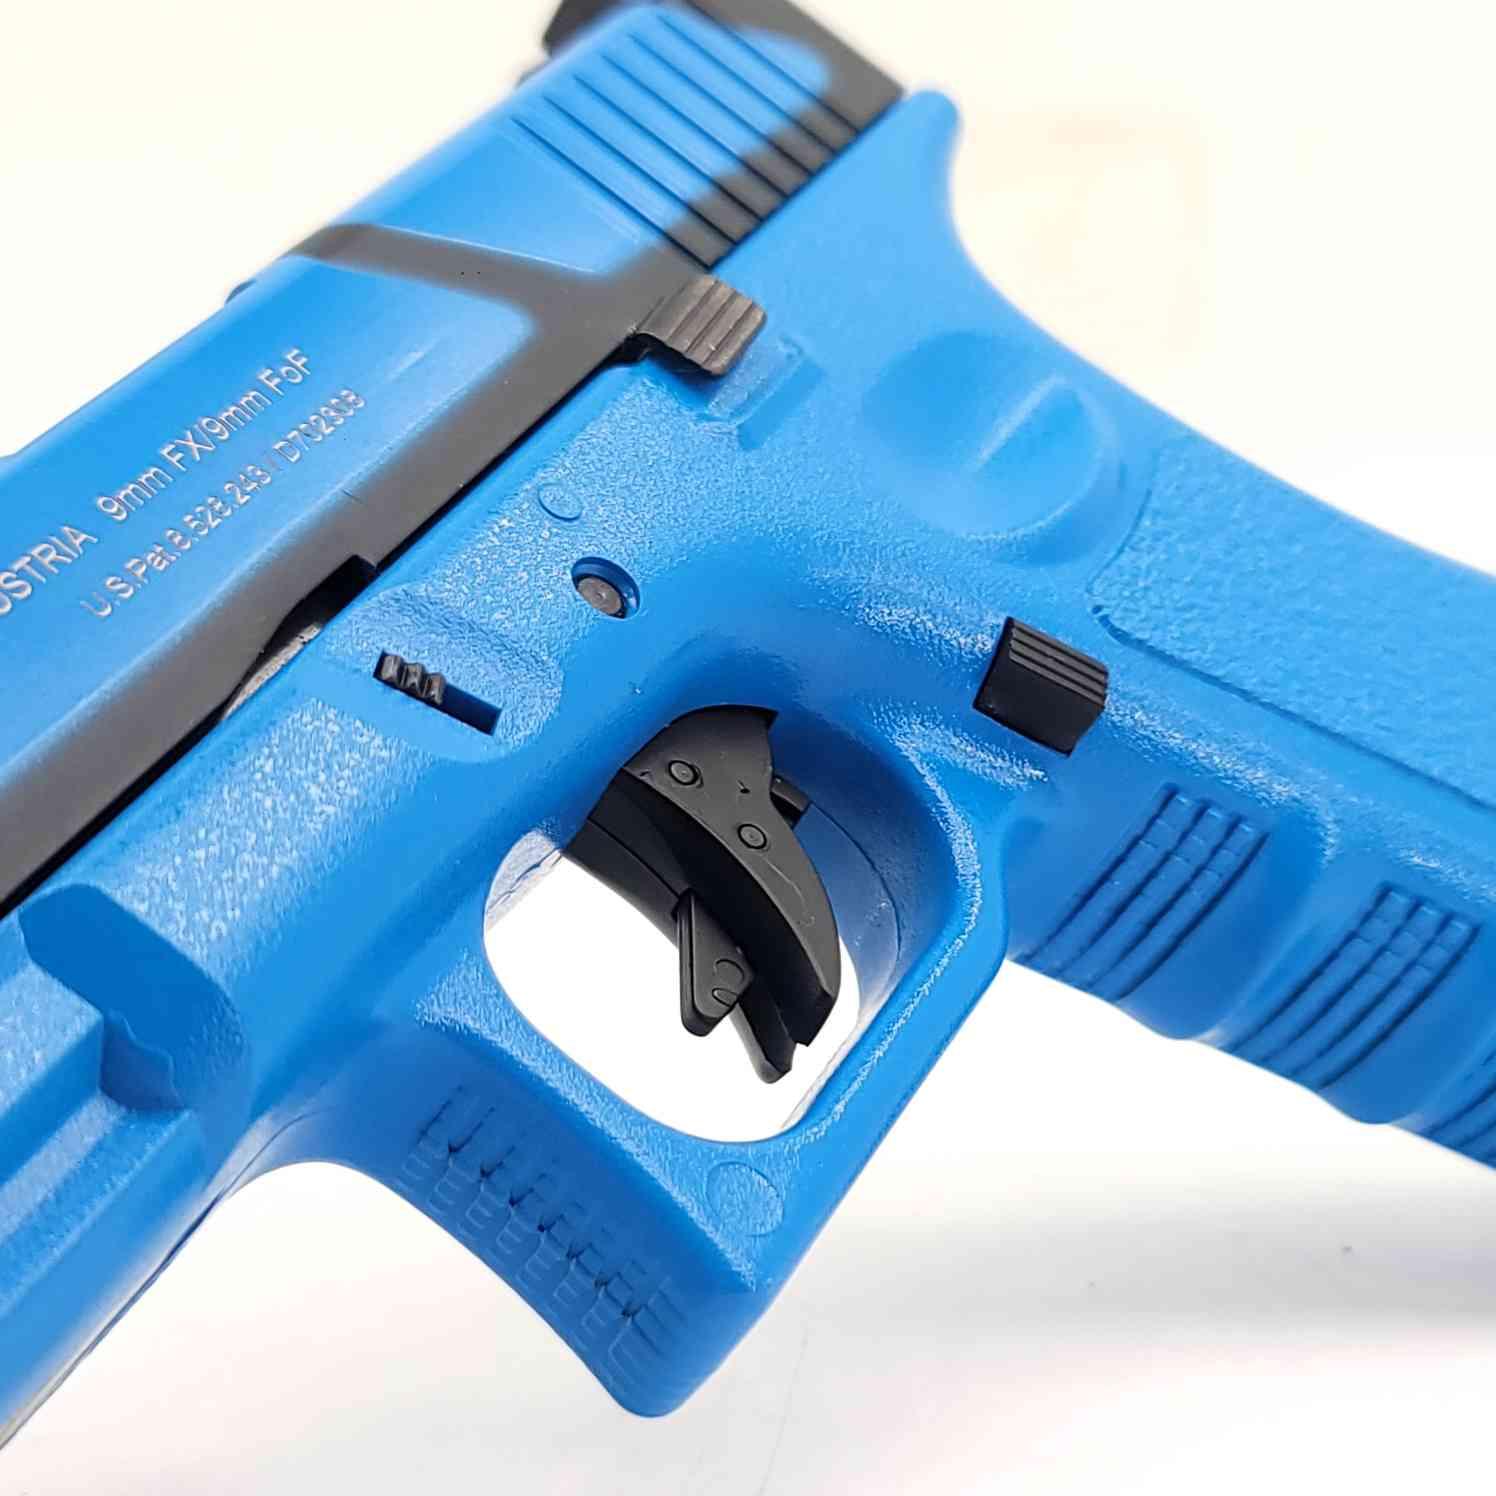 DOUBLE BELL Glock G17T SpeedQB Gas Powered Gel Blaster BLUE [721-1] Renegade Blasters